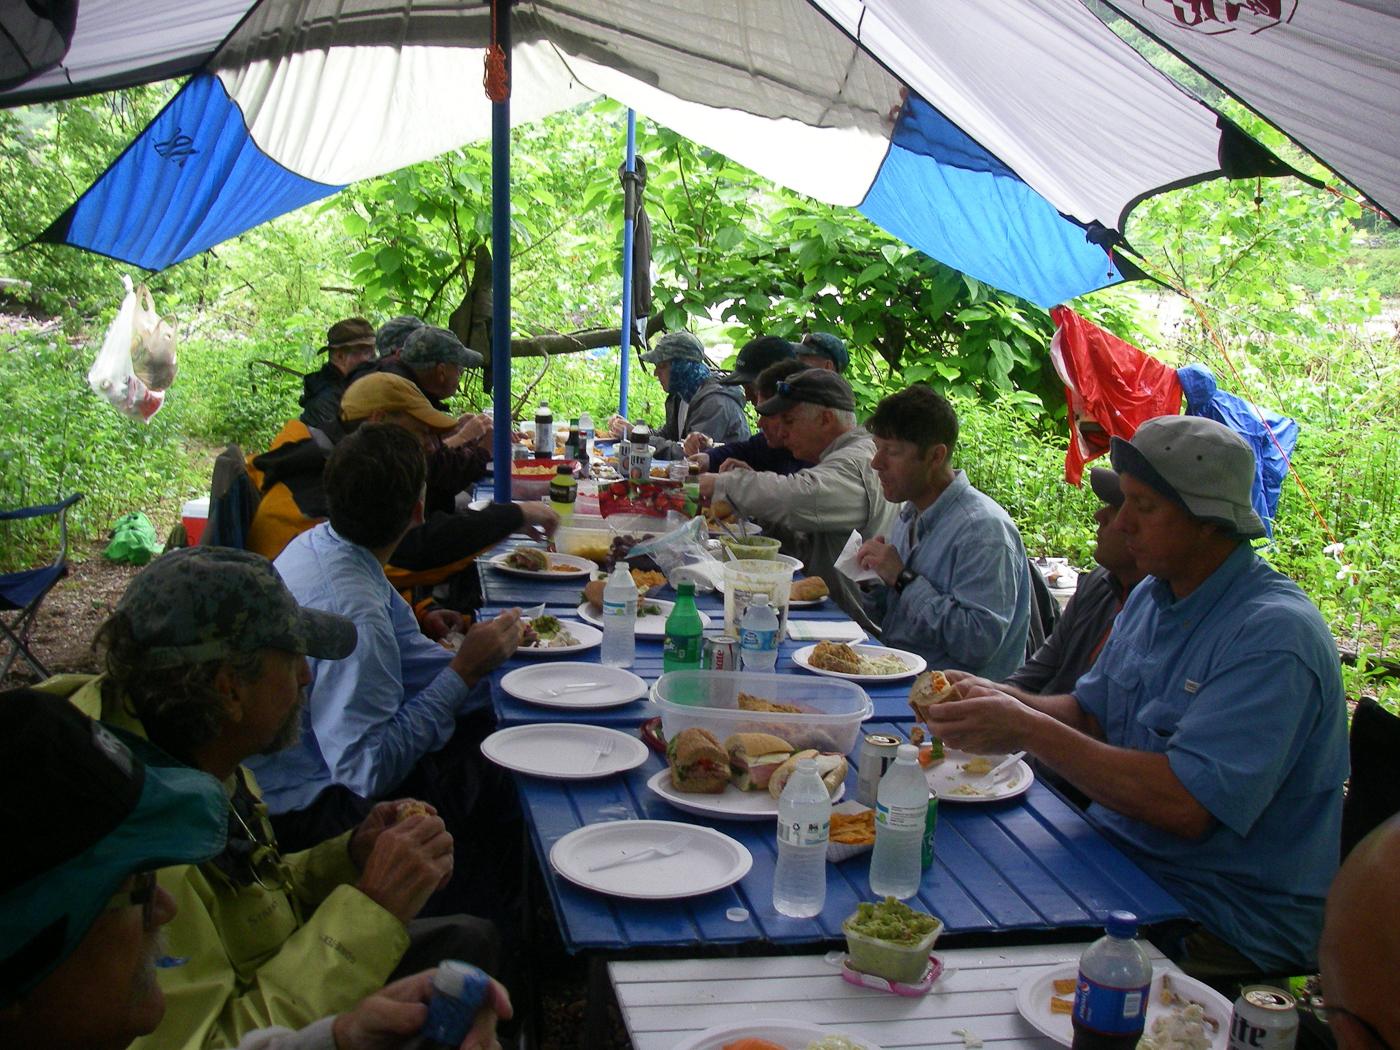 mark-kovach-fishing-services-trip-lunch-002.jpg